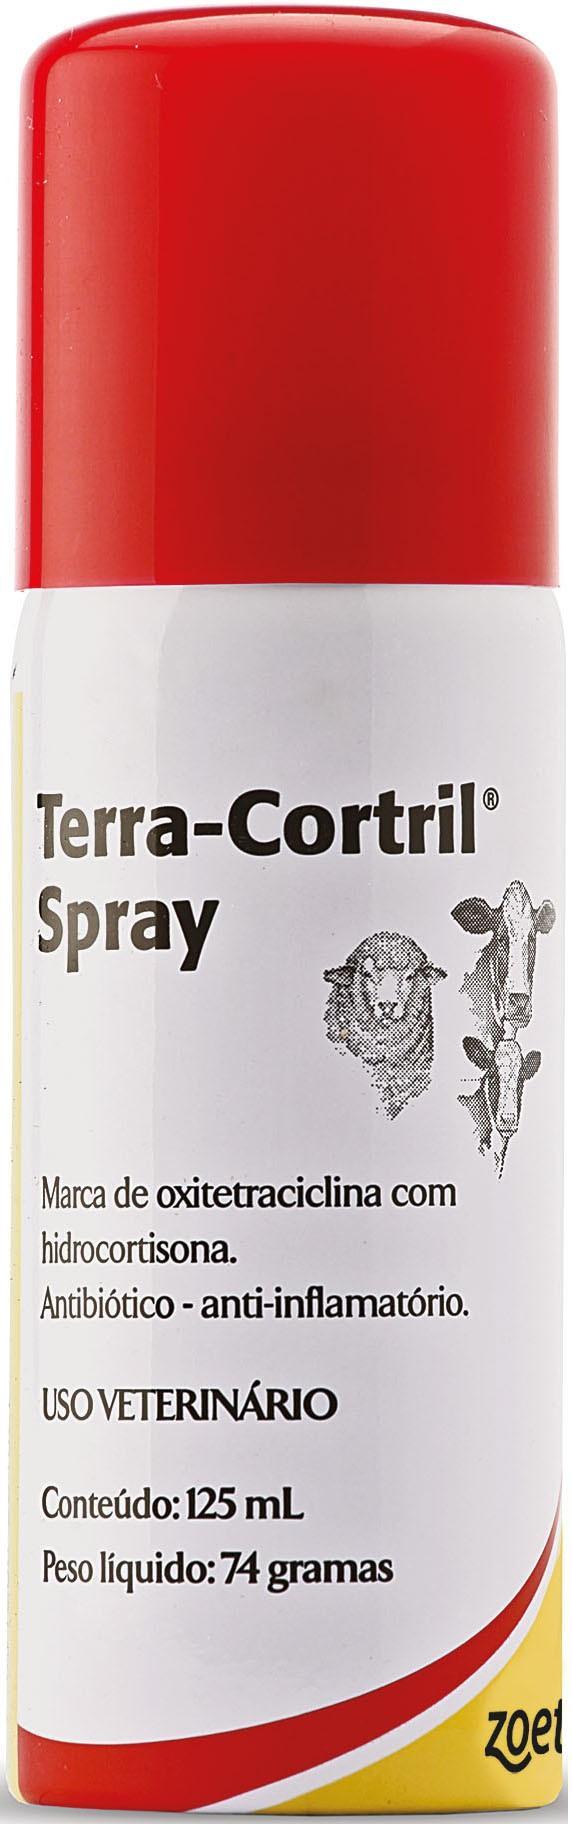 TERRA-CORTRIL SPRAY 125ML